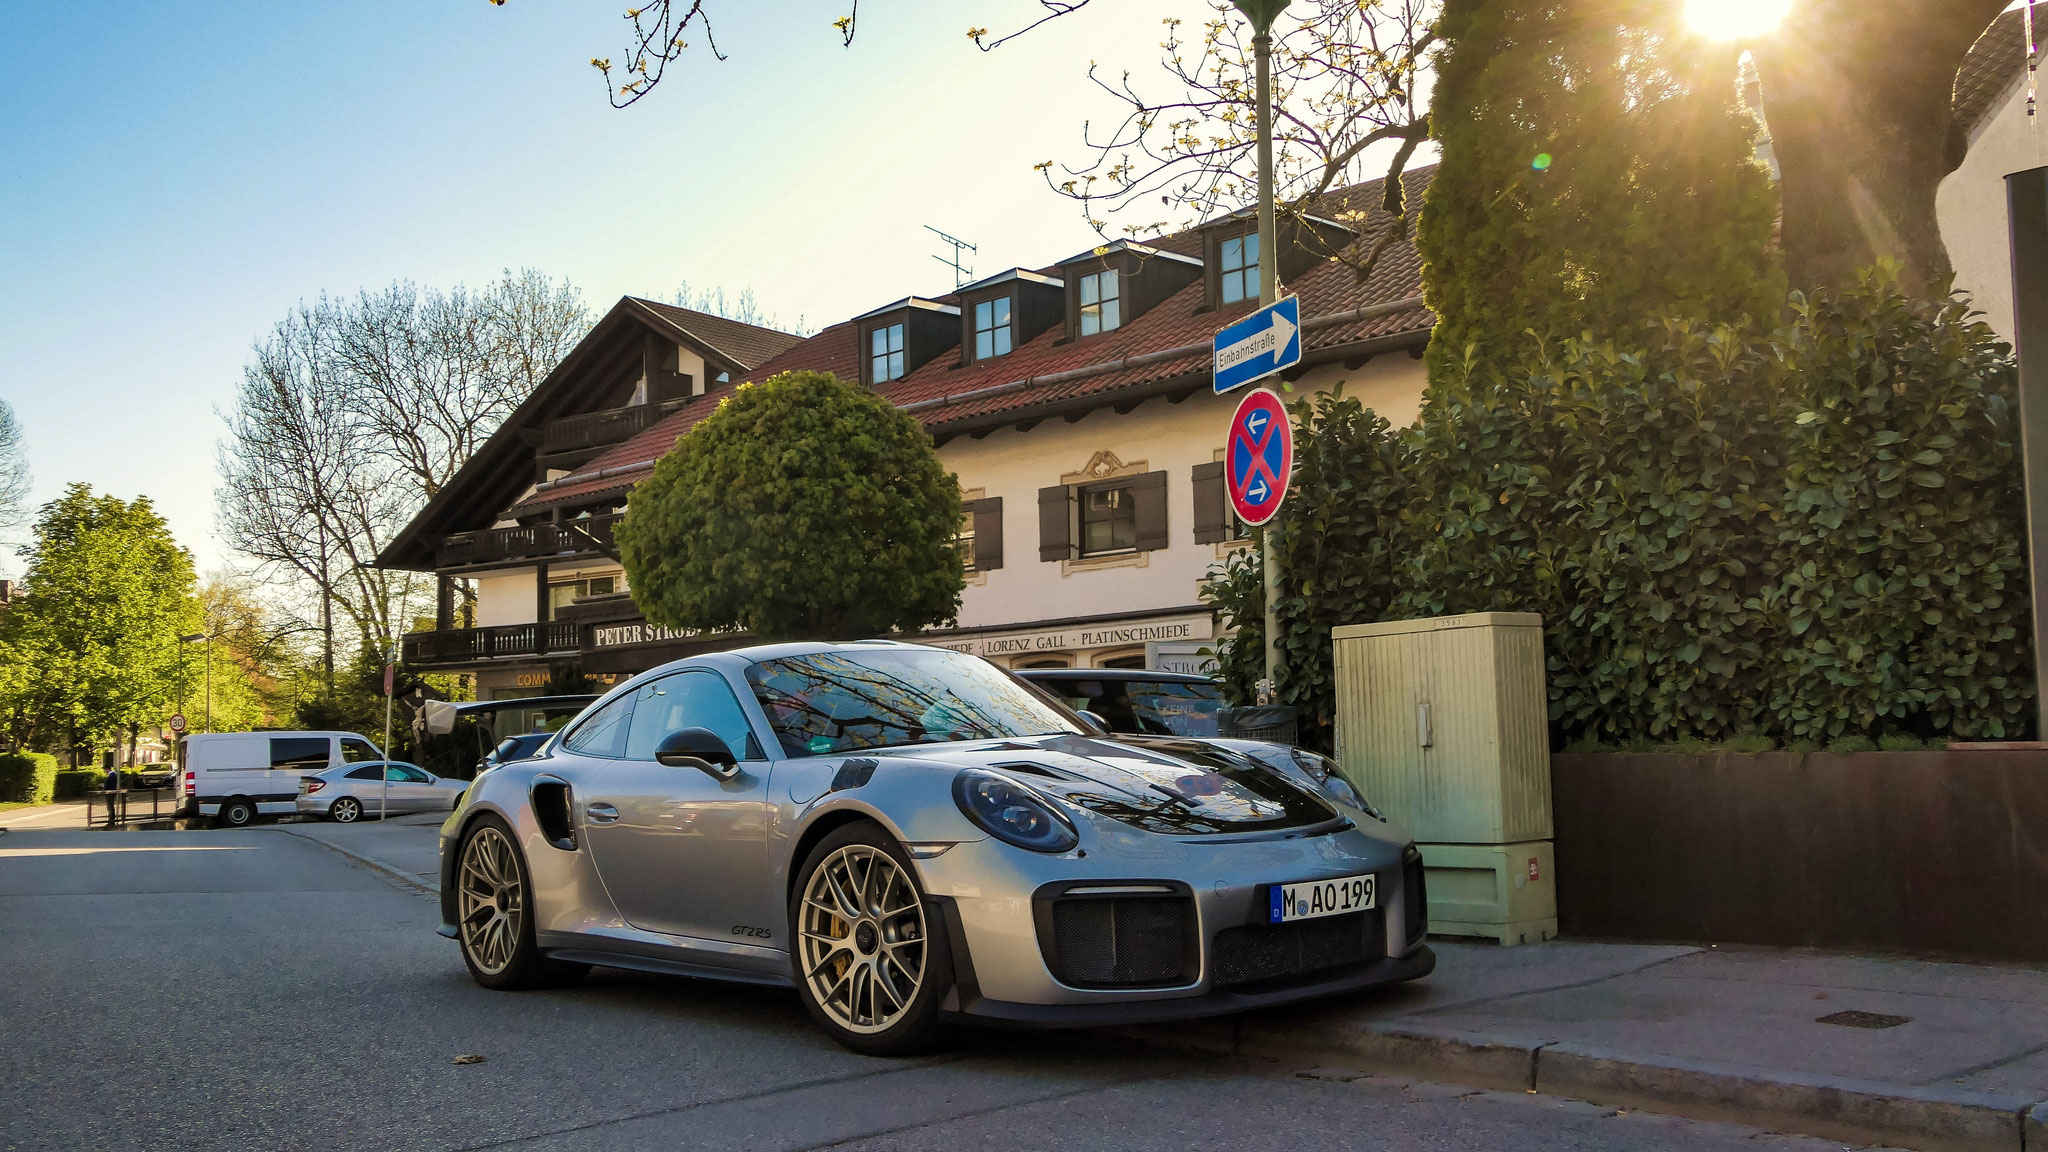 Porsche GT2 RS - M-AO-199